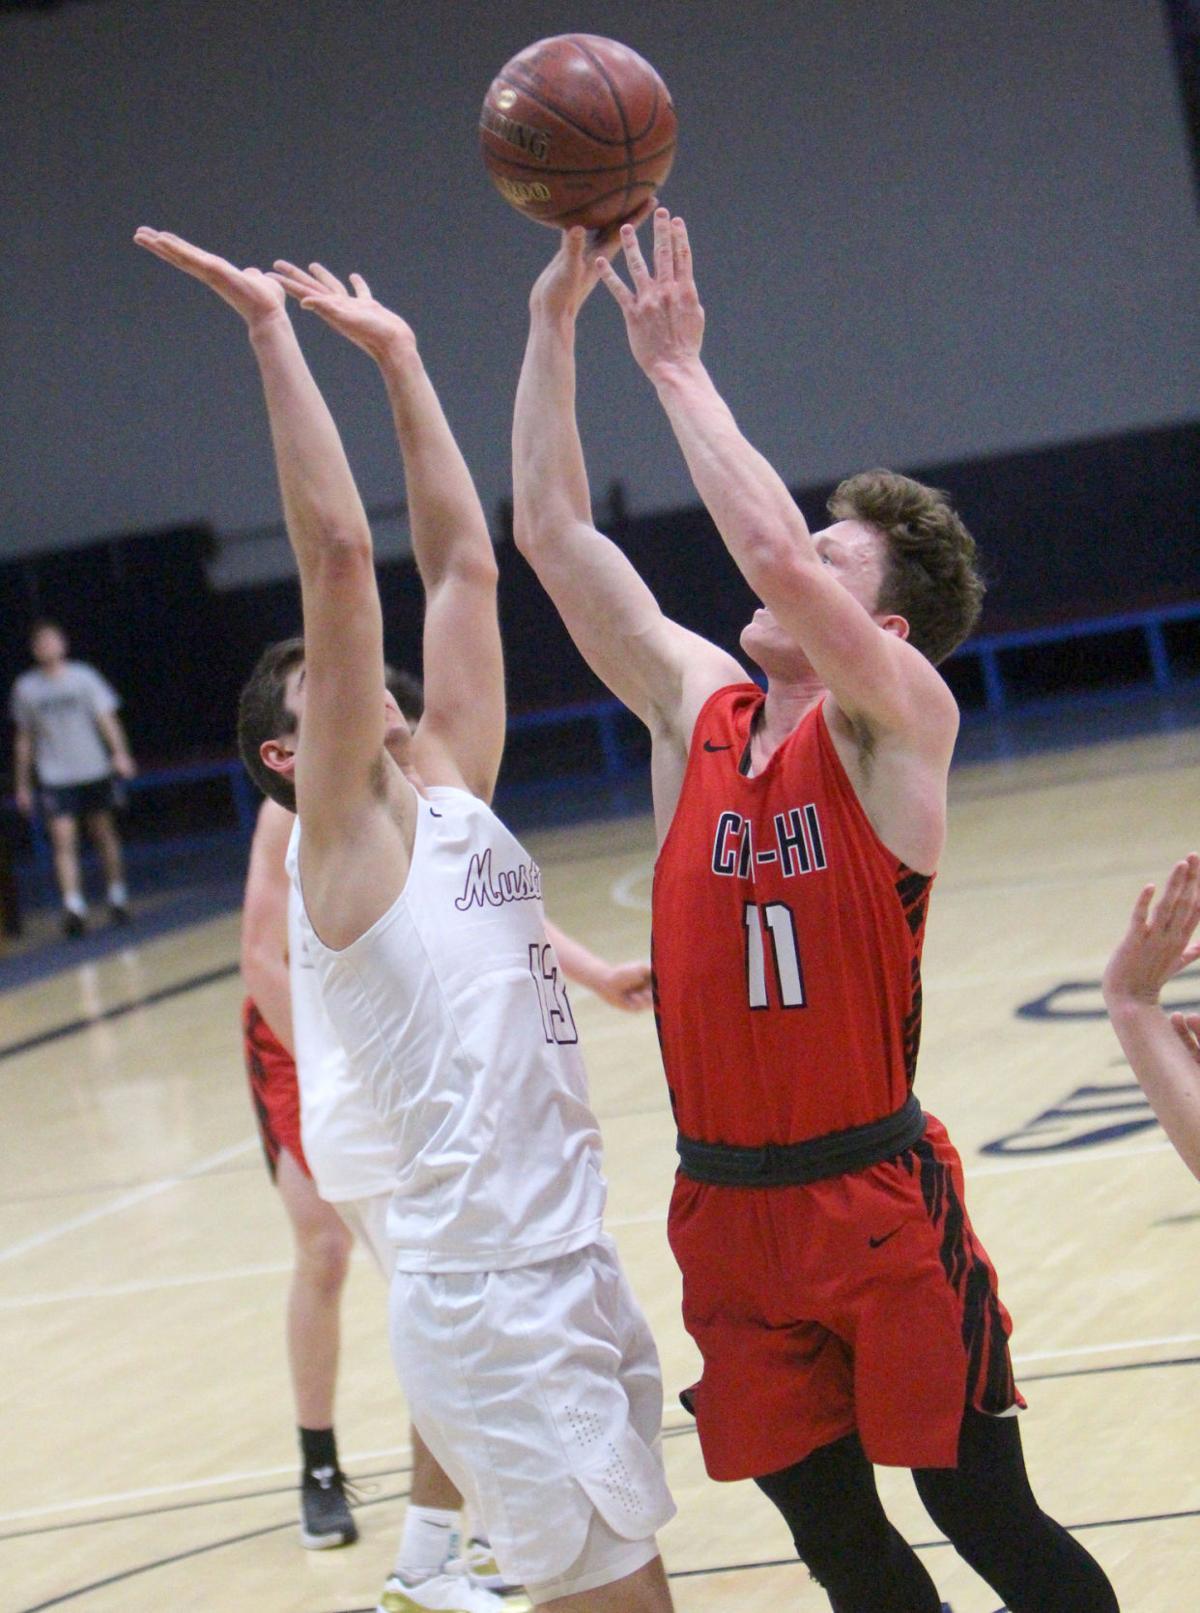 Chi-Hi at Menomonie boys basketball 2-25-20